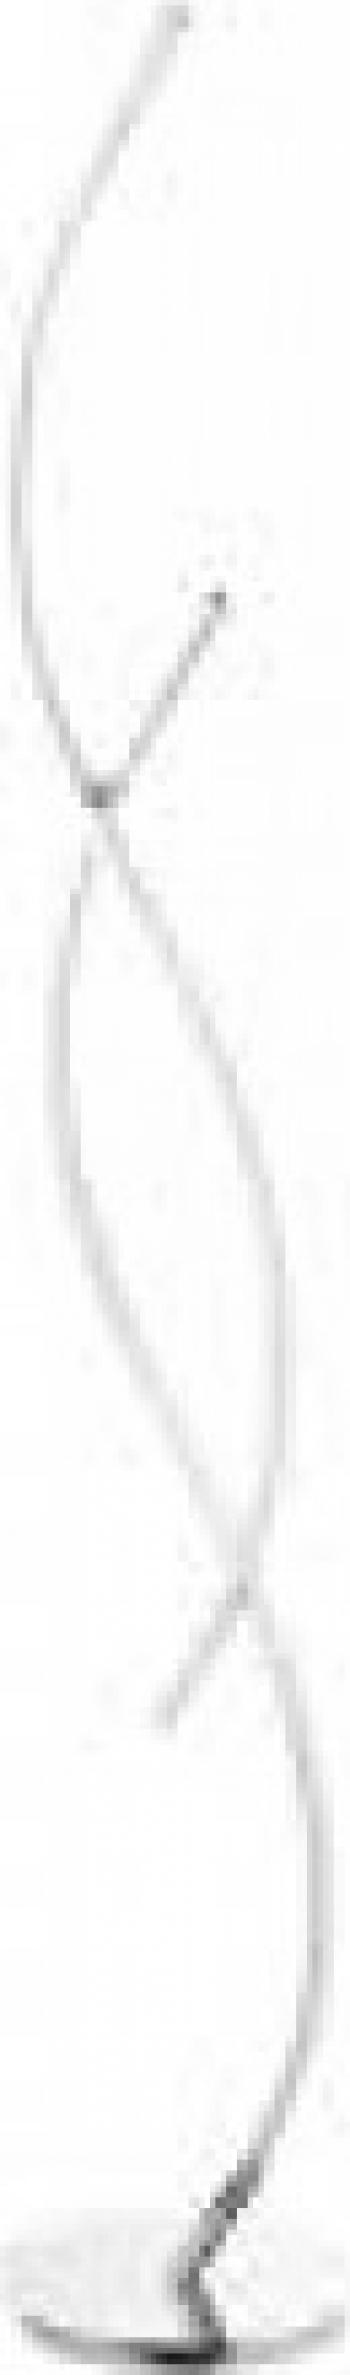 LAMPADAR ELLIS MOD200-22-N